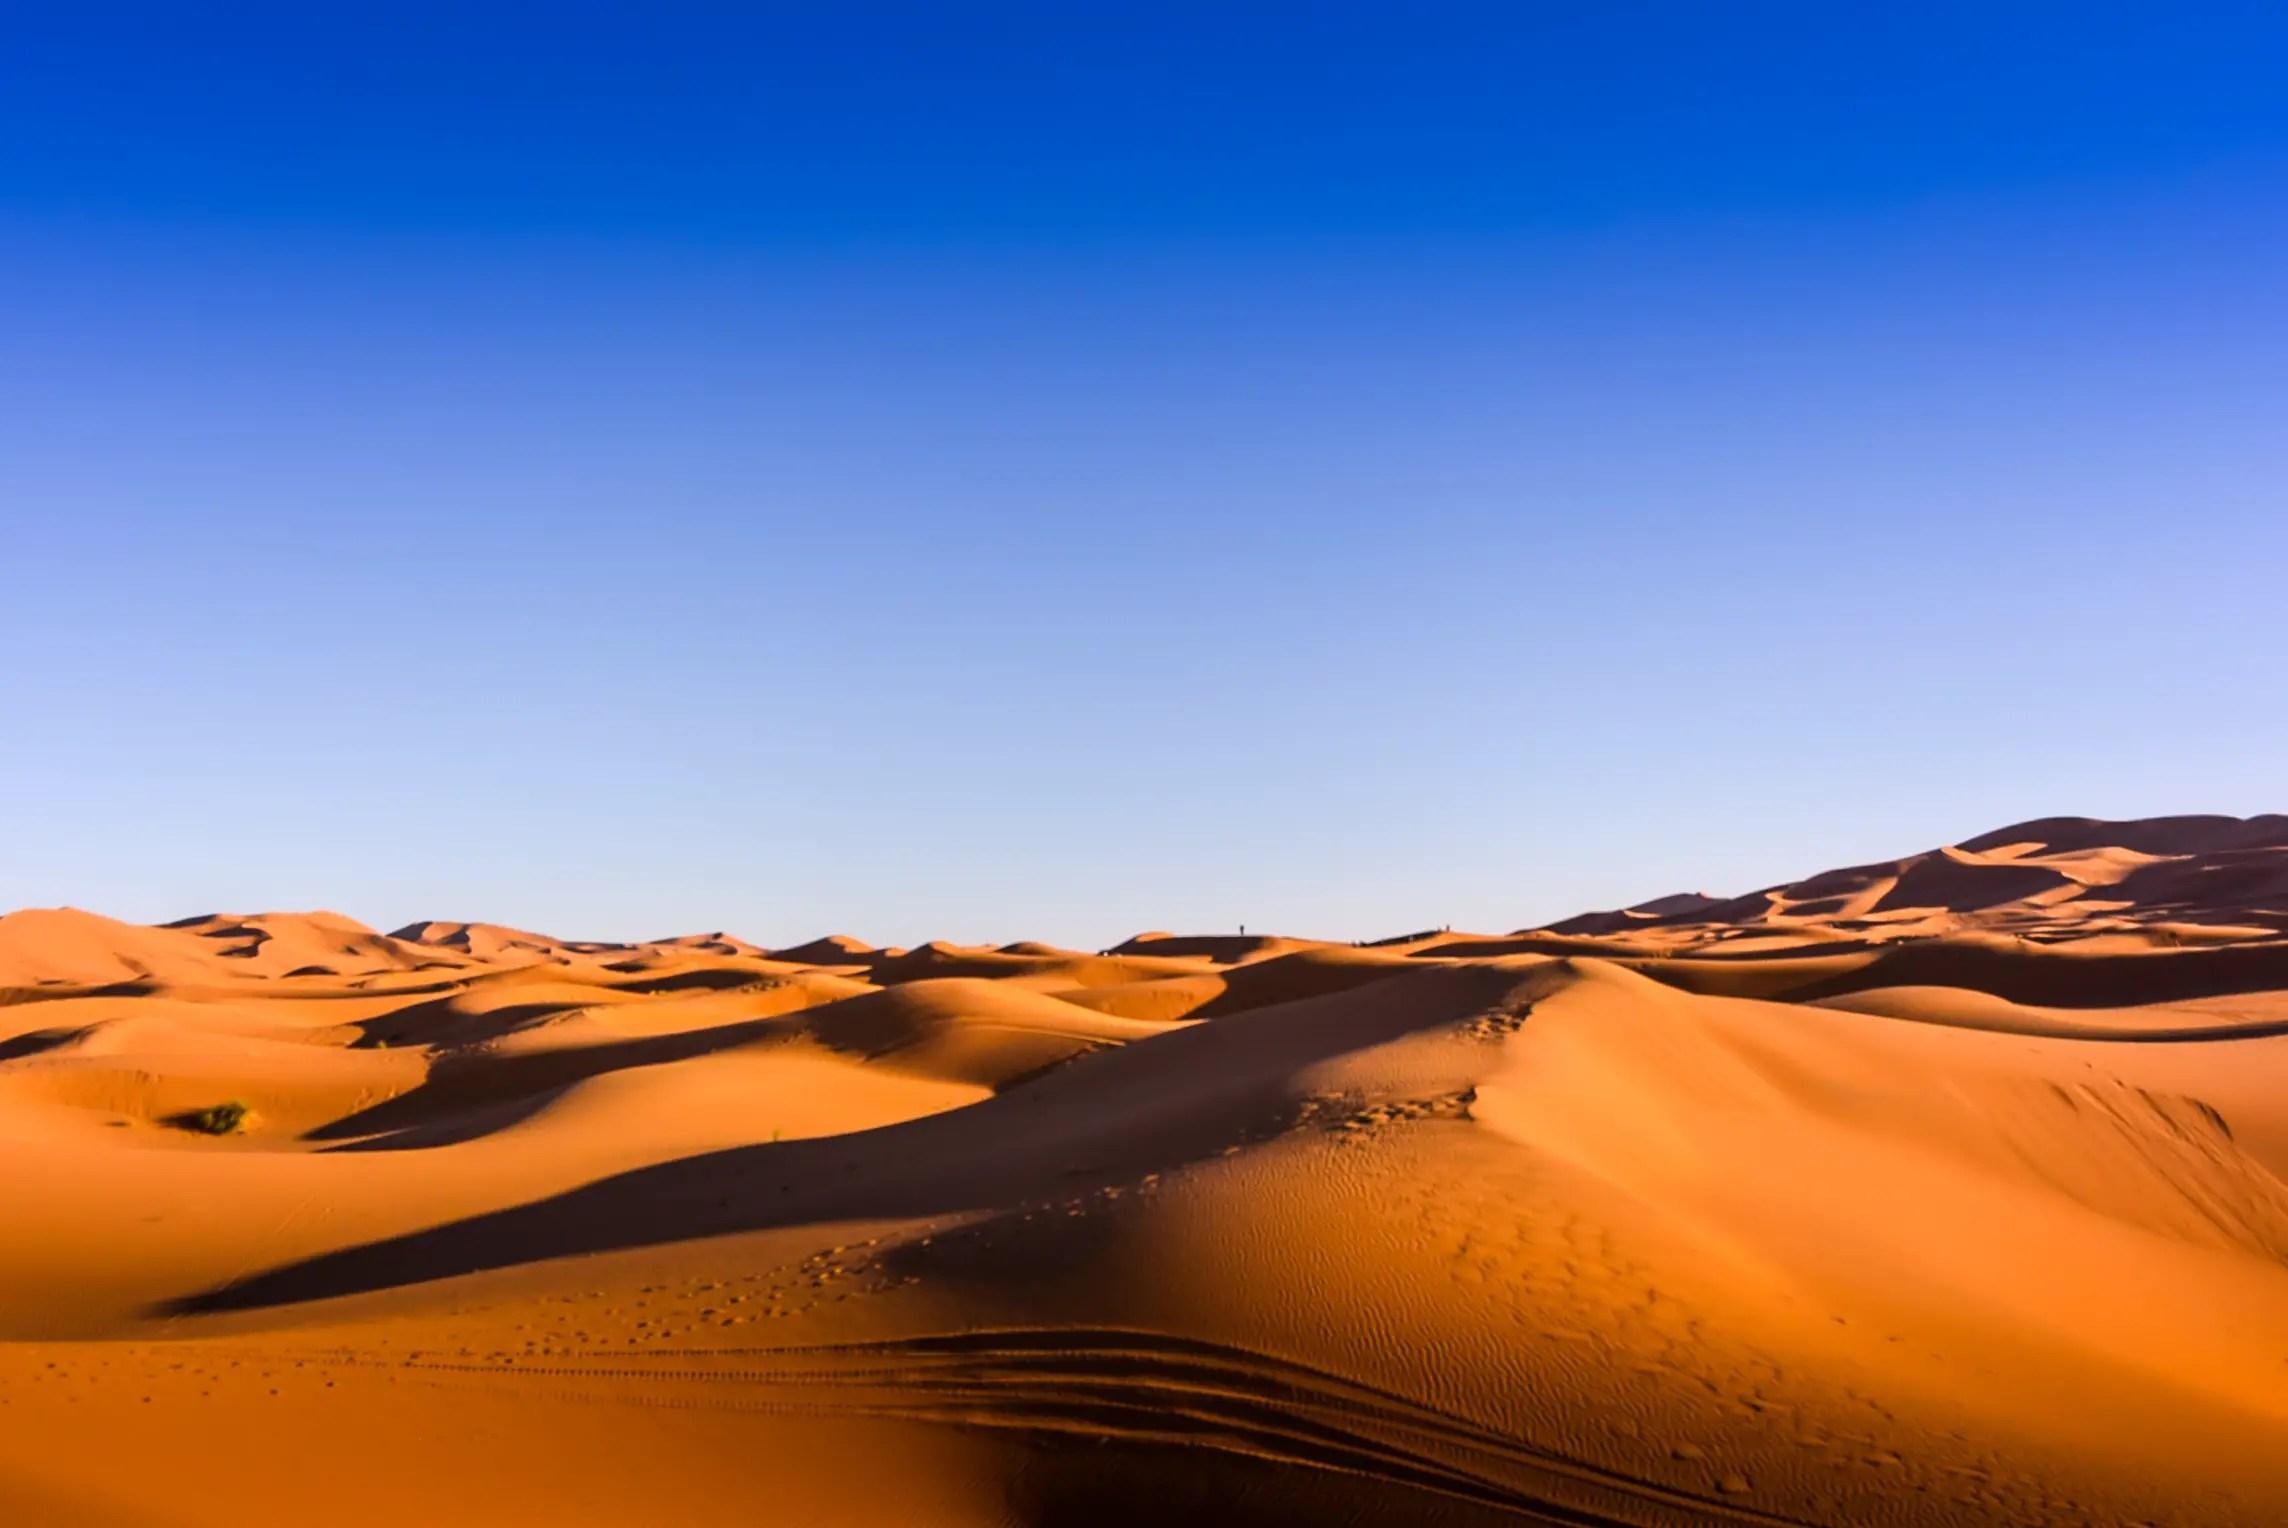 sahara desert images - HD2288×1528